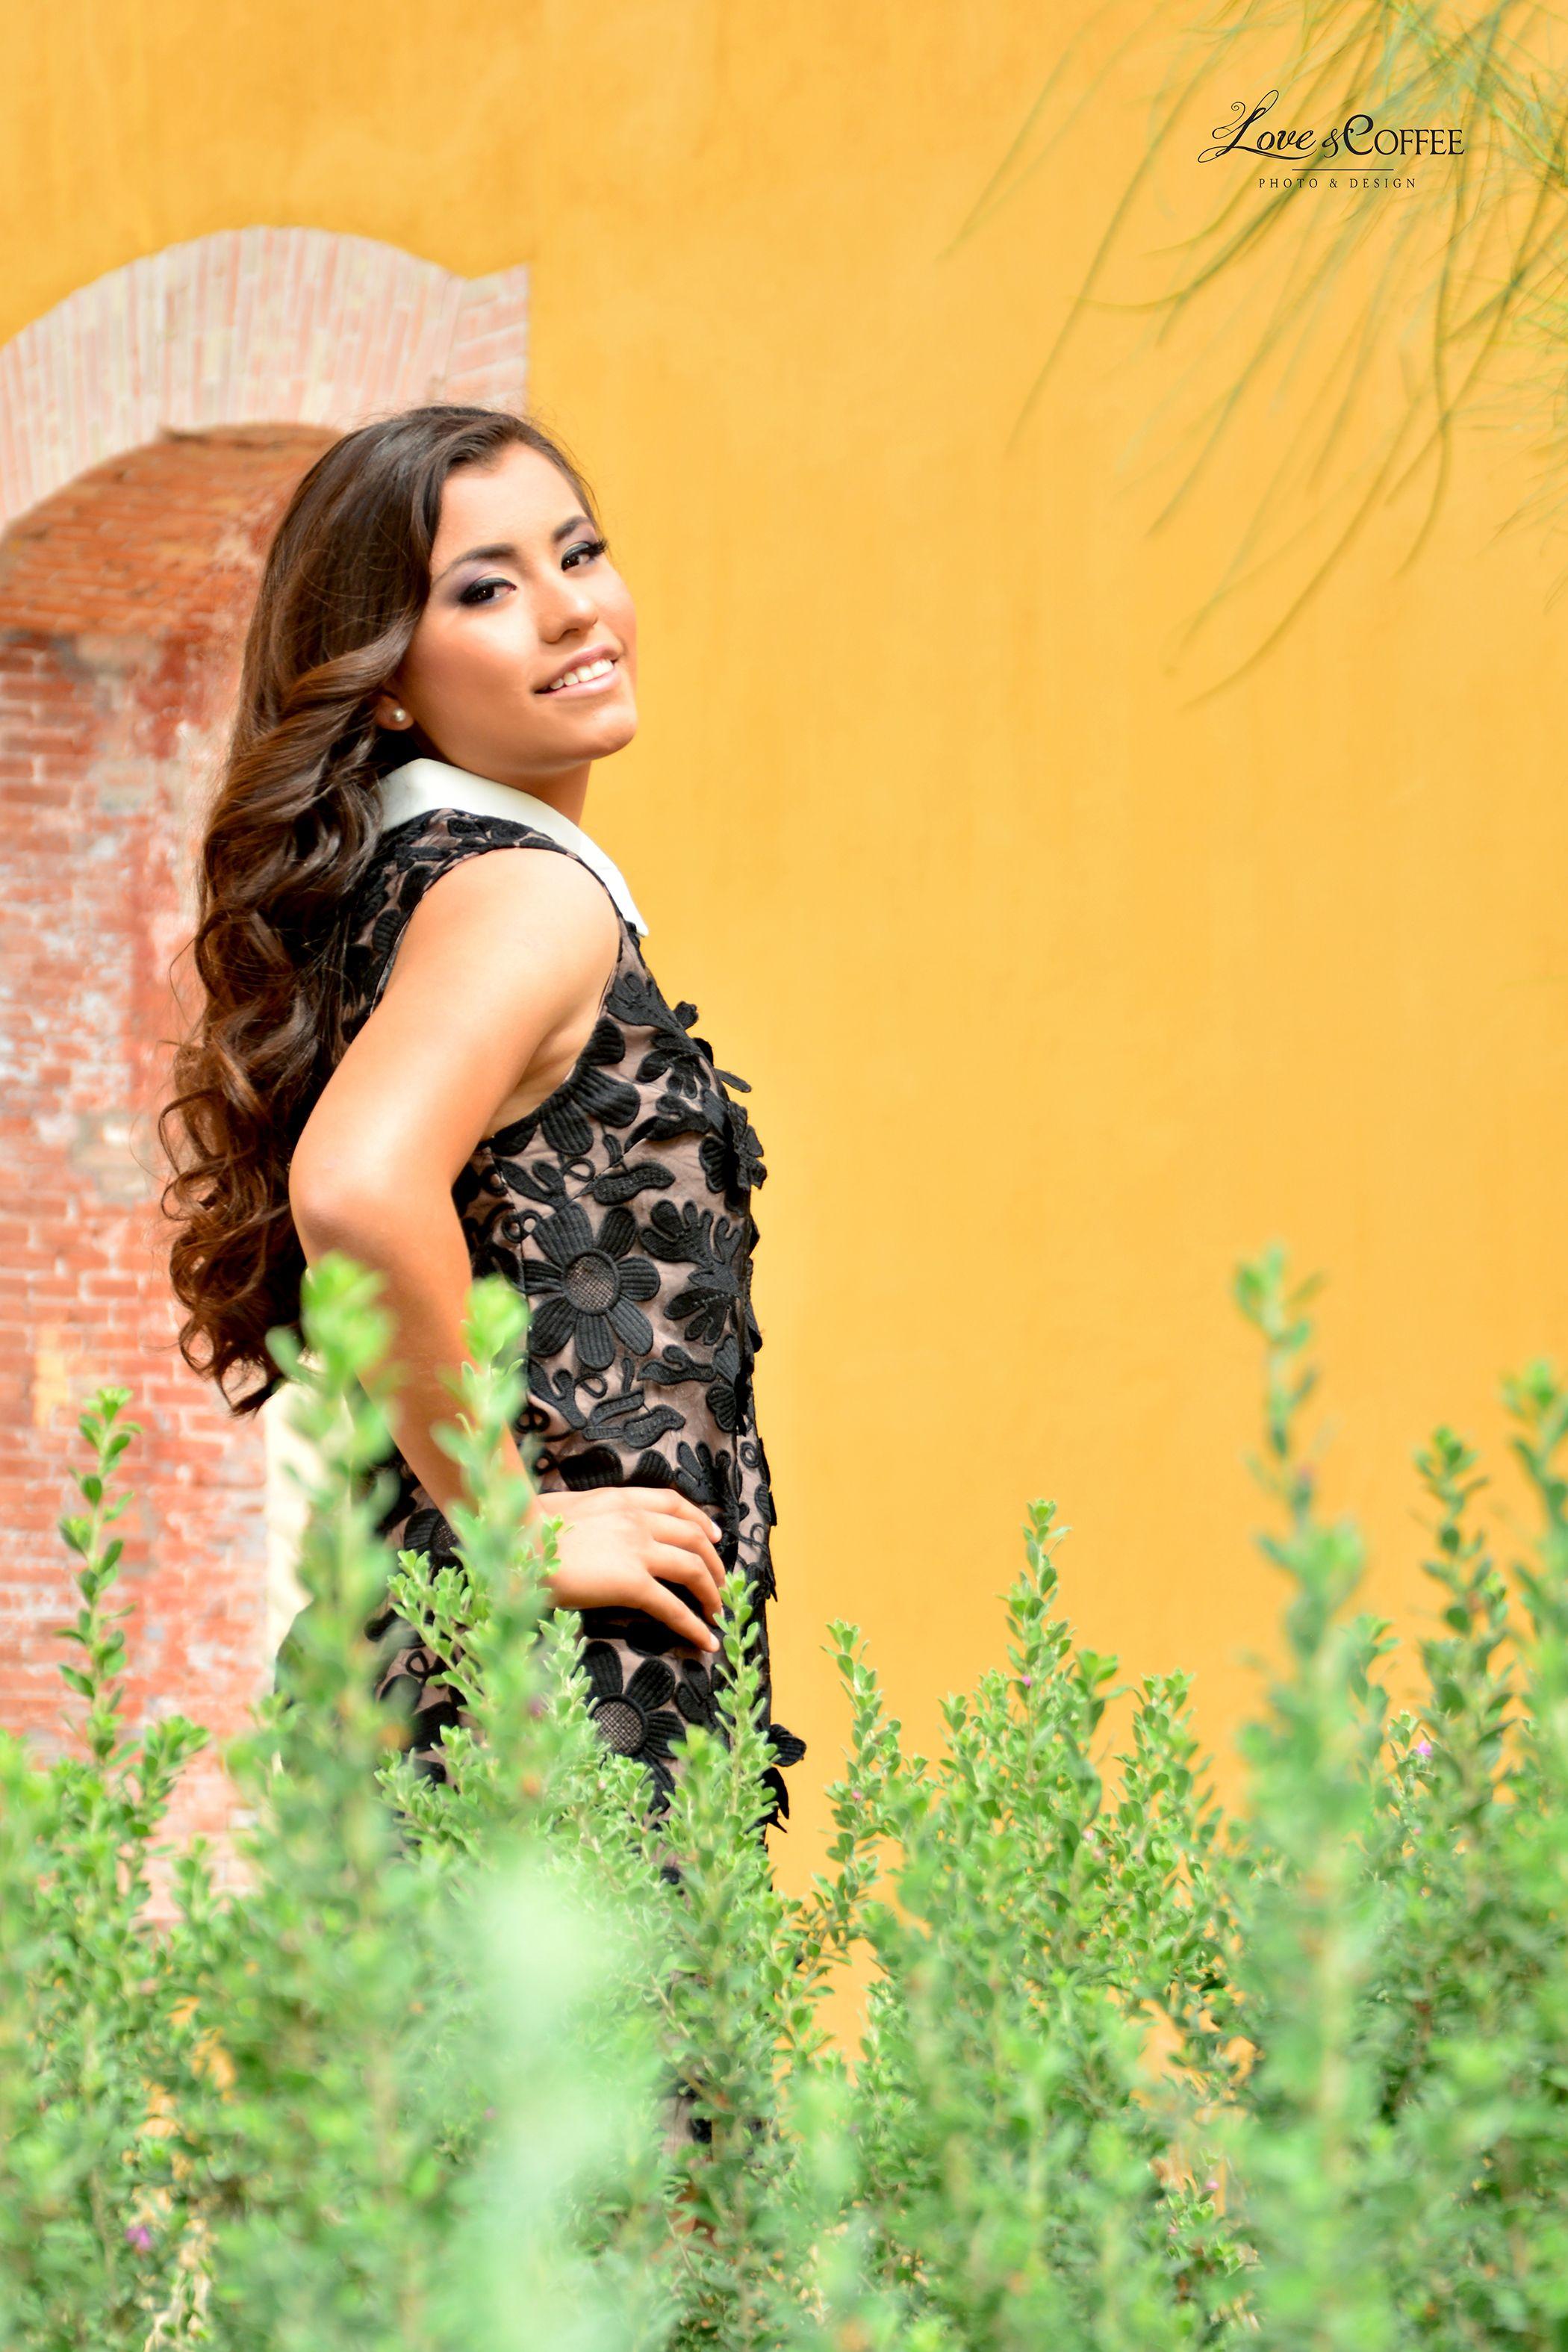 XV Daniela. Casual! #loveandcoffee #fotografia #xvaños